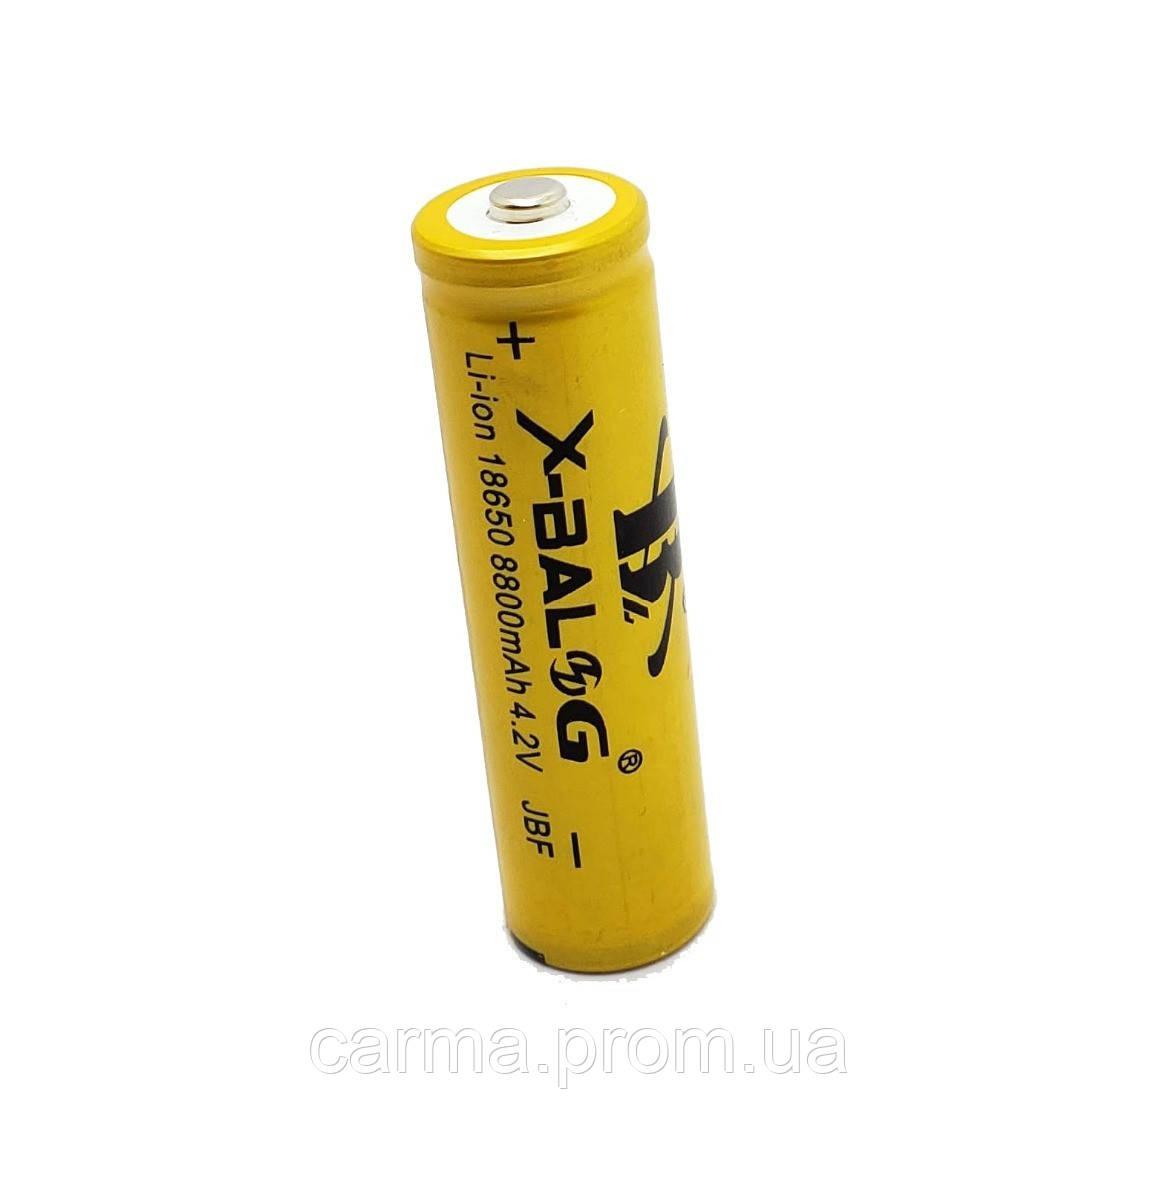 Аккумулятор X-Balog Li-Ion 18650 8800 mAh 4.2V